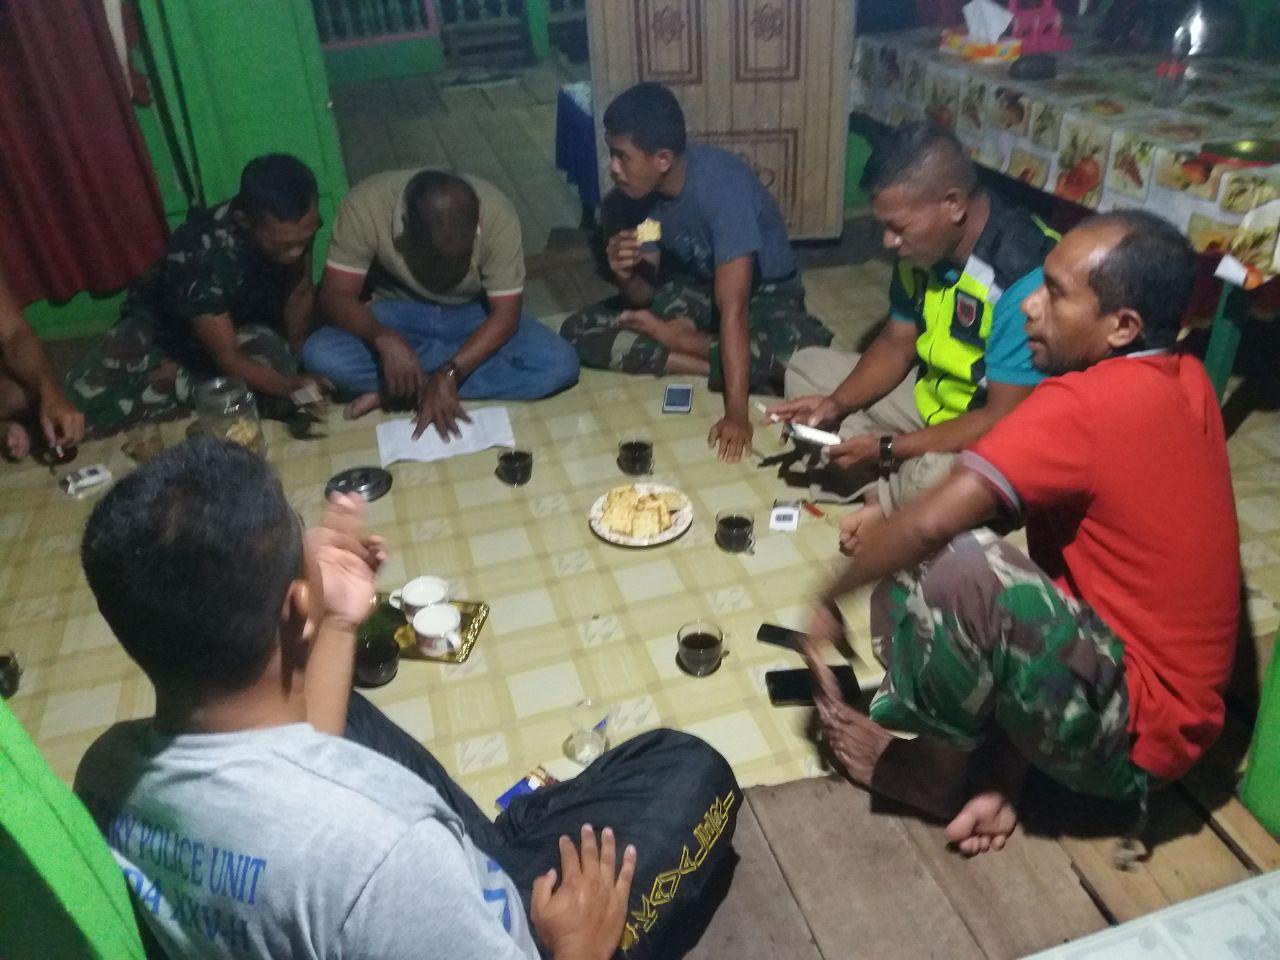 Libatkan Warga, Rapat Evaluasi Pekerjaan TMMD Dilaksanakan di Rumah Warga